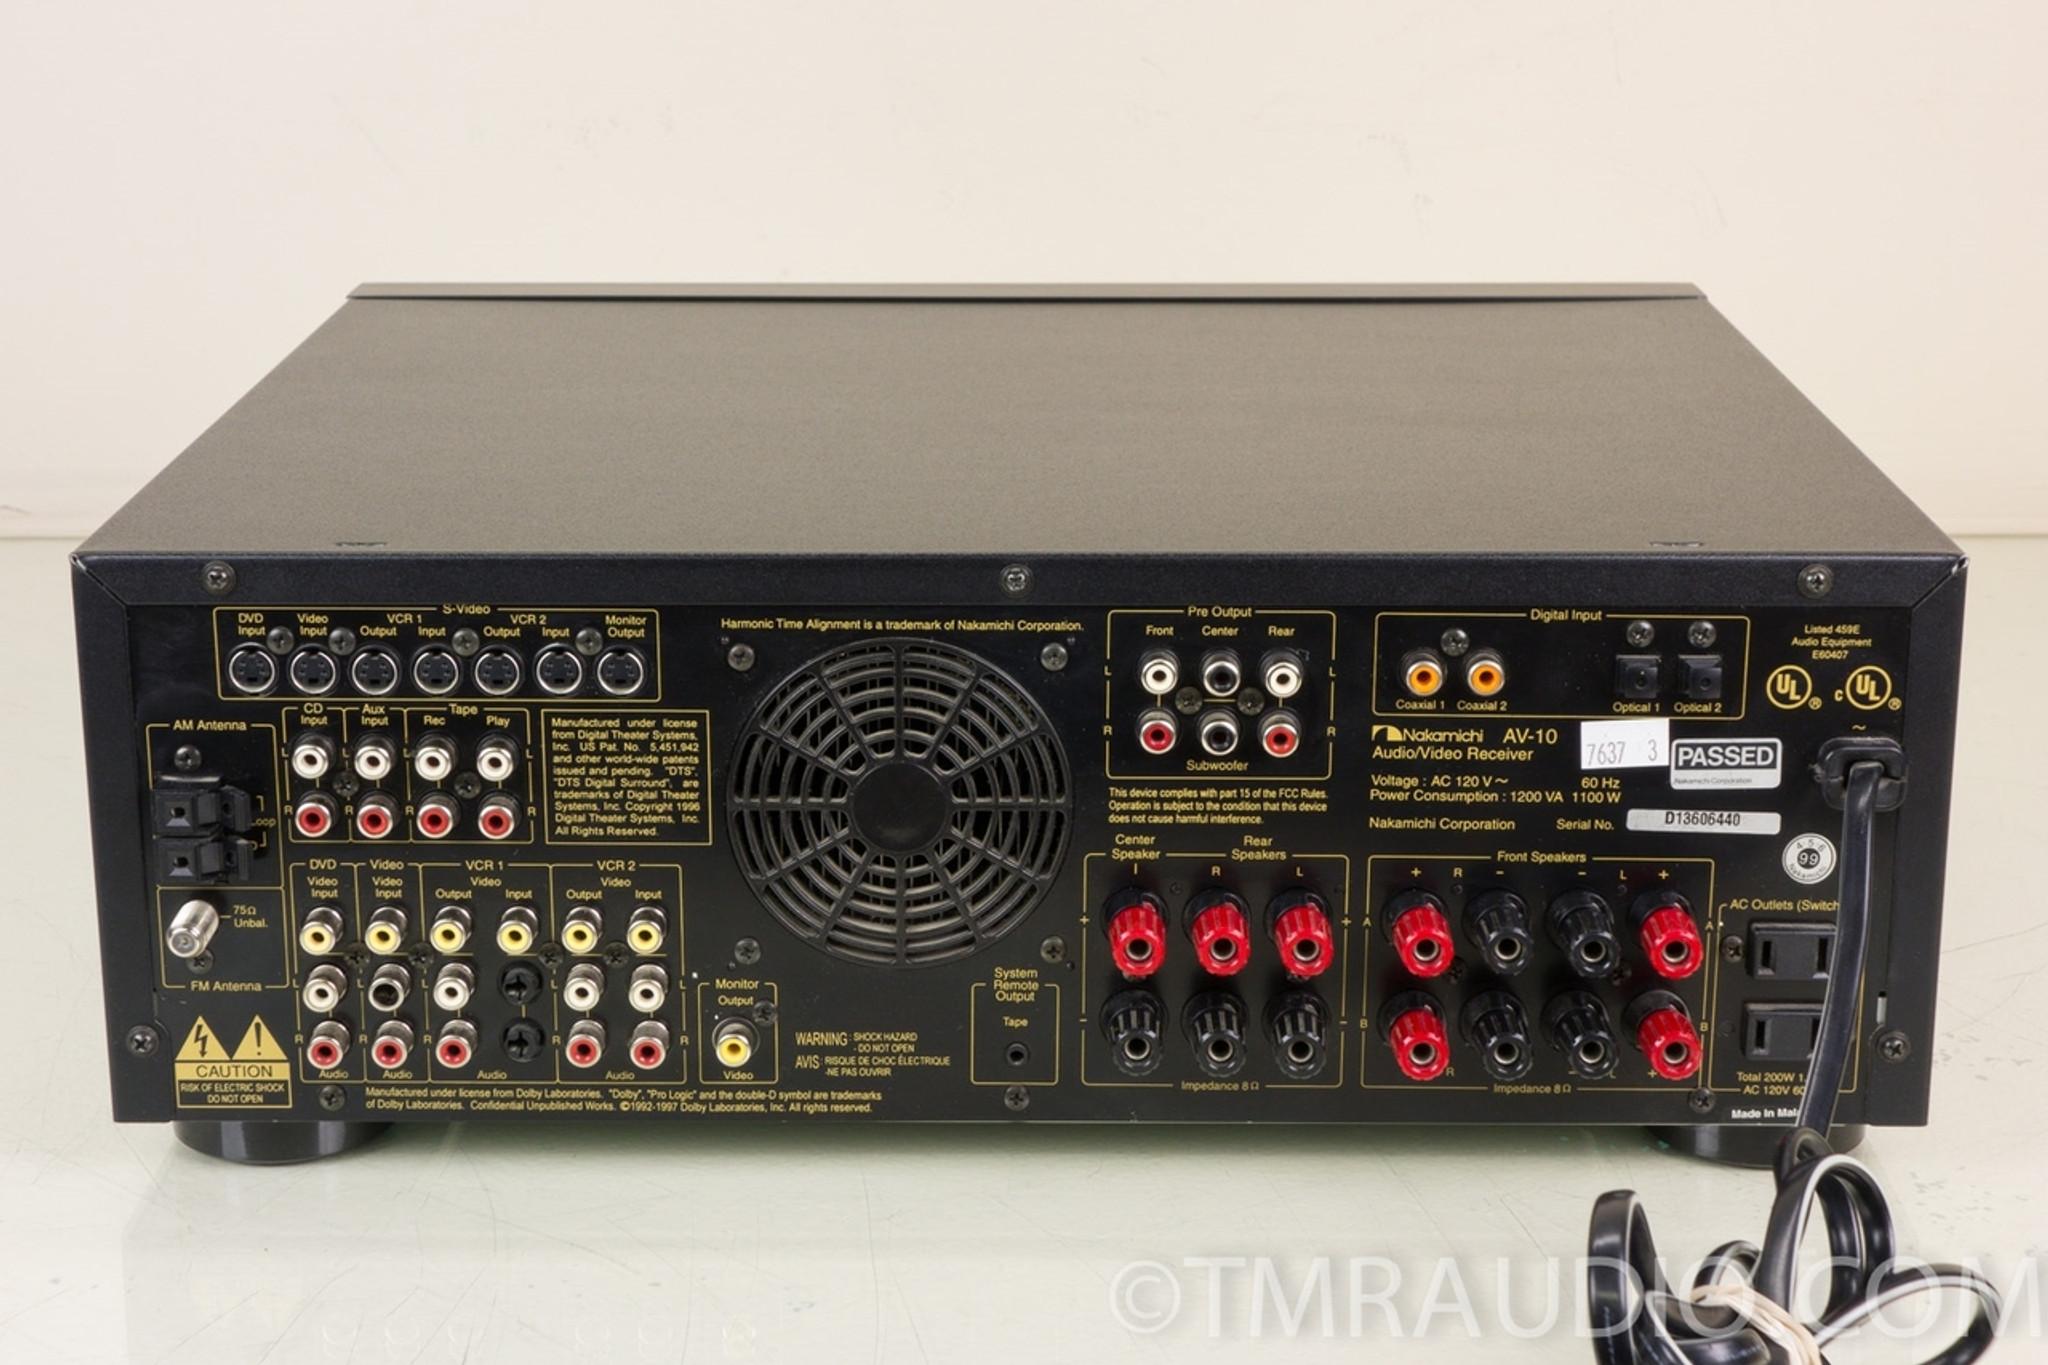 nakamichi av 10 5 1 channel 750 watt home theater stereo receiver [ 1280 x 853 Pixel ]